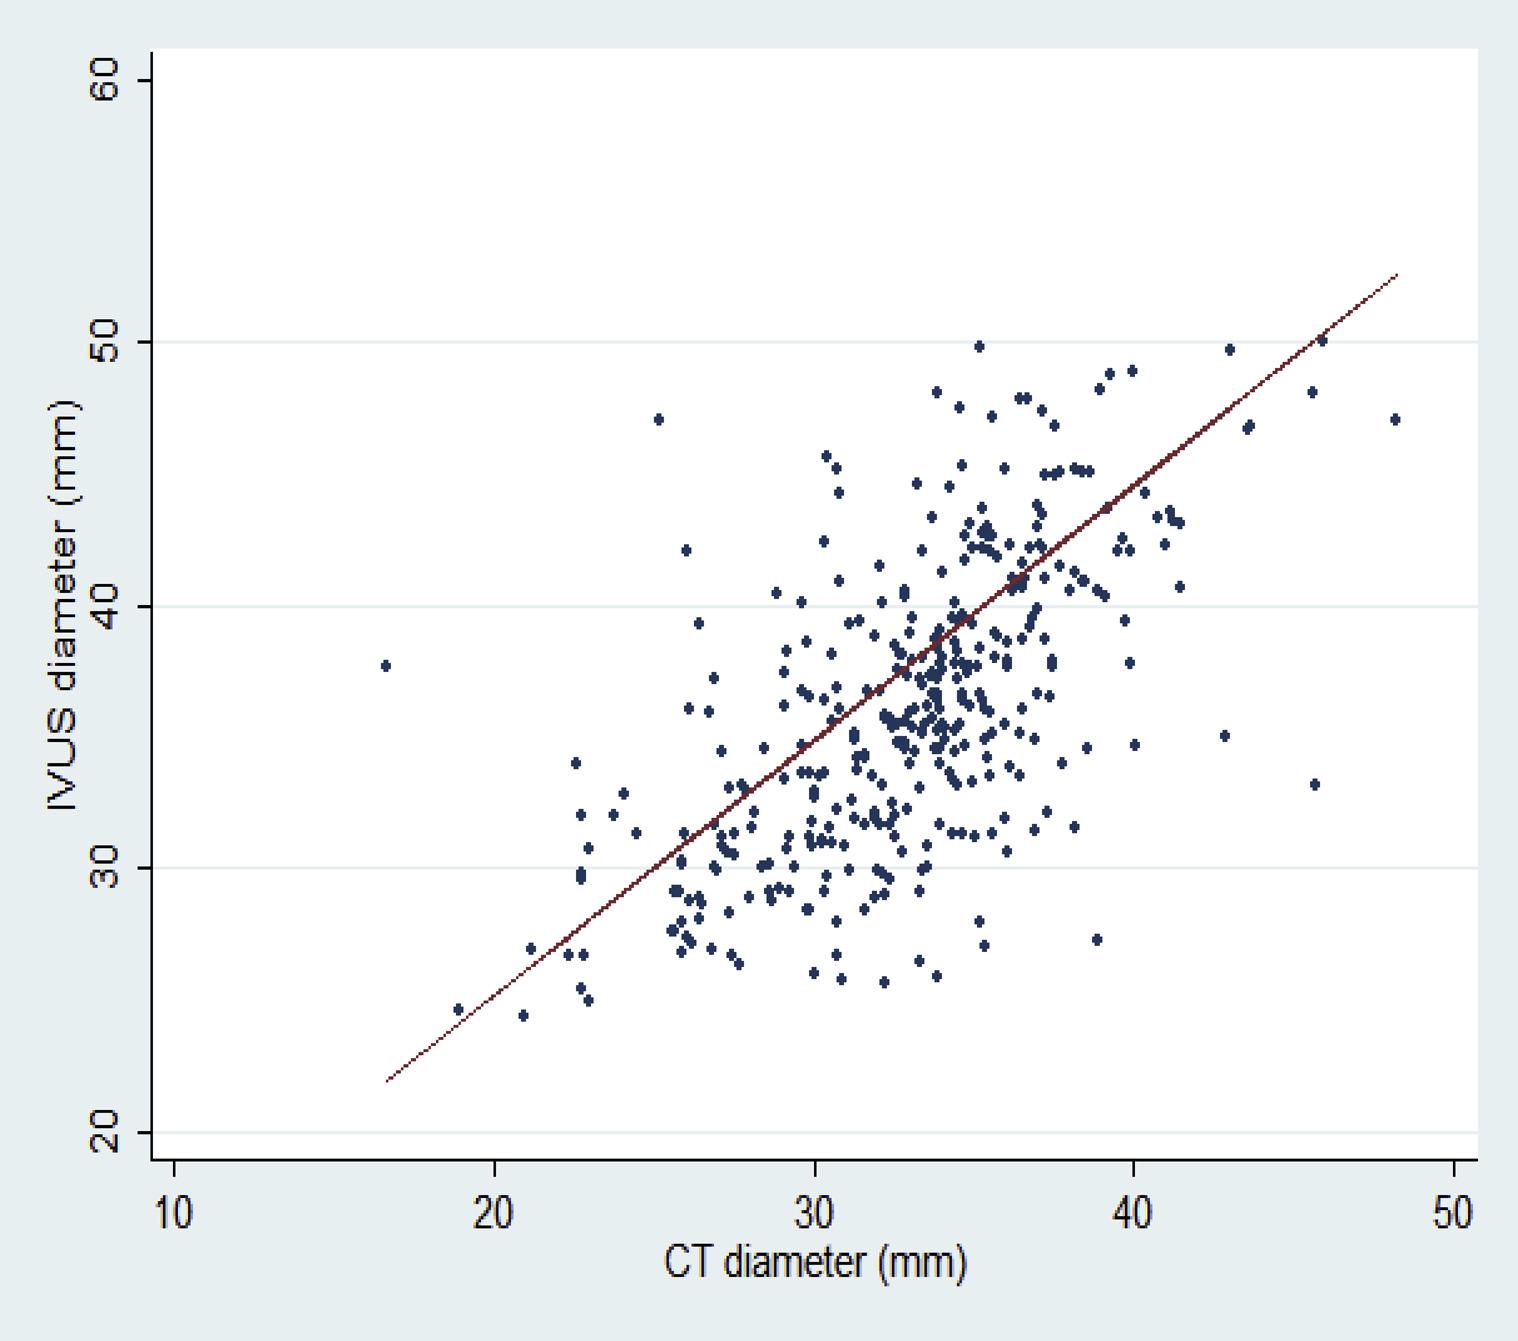 Comparison of intravascular ultrasound- and centerline